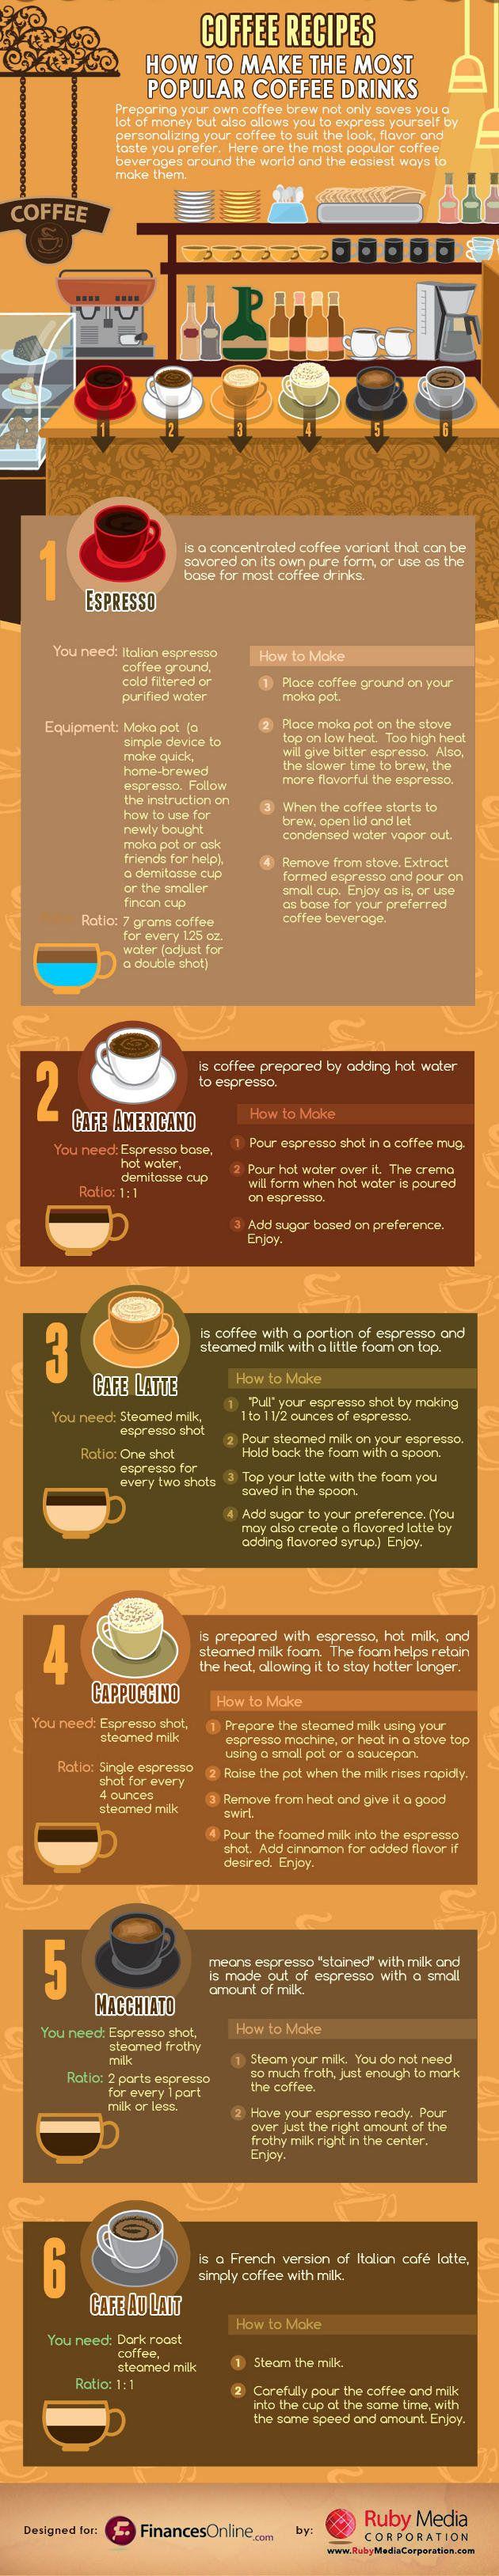 Coffee 101: Basic coffee recipes